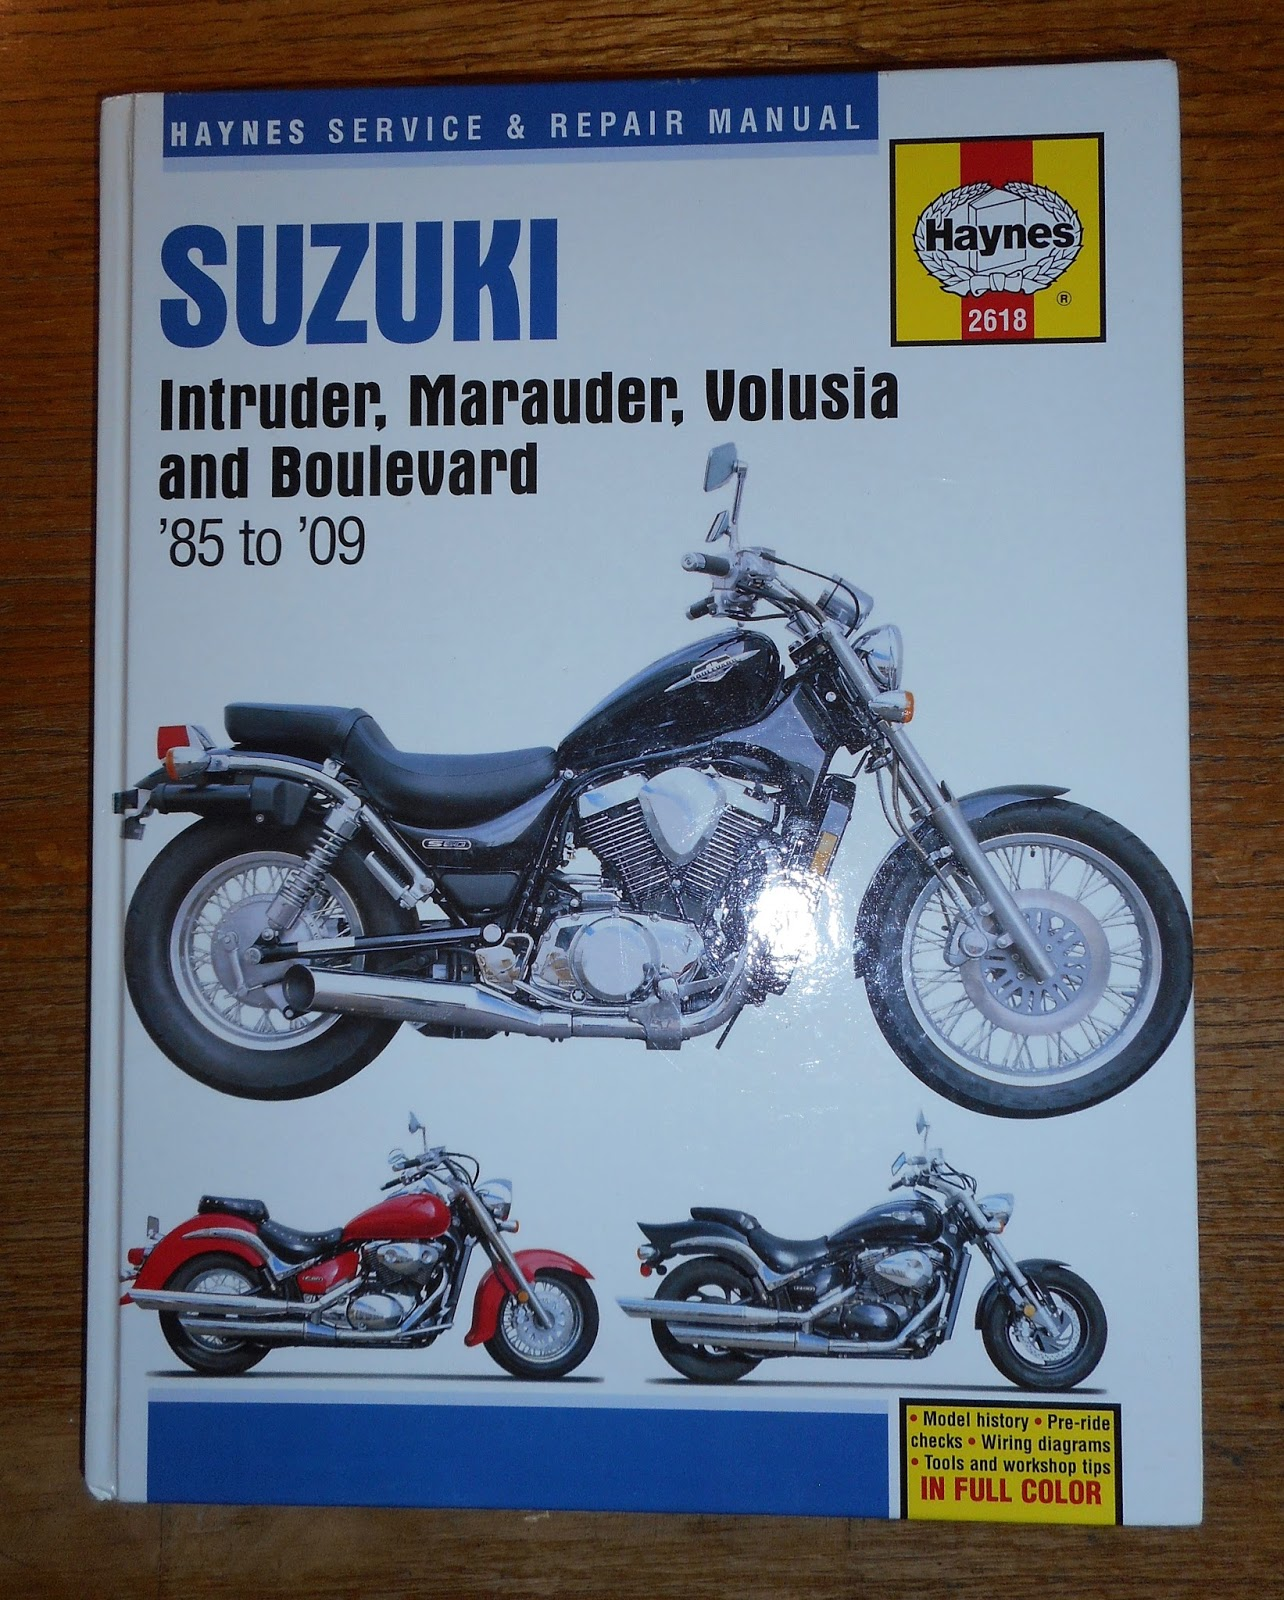 moto guzzi v7 stone v7 special v7 racer full service repair manual 2012 2013